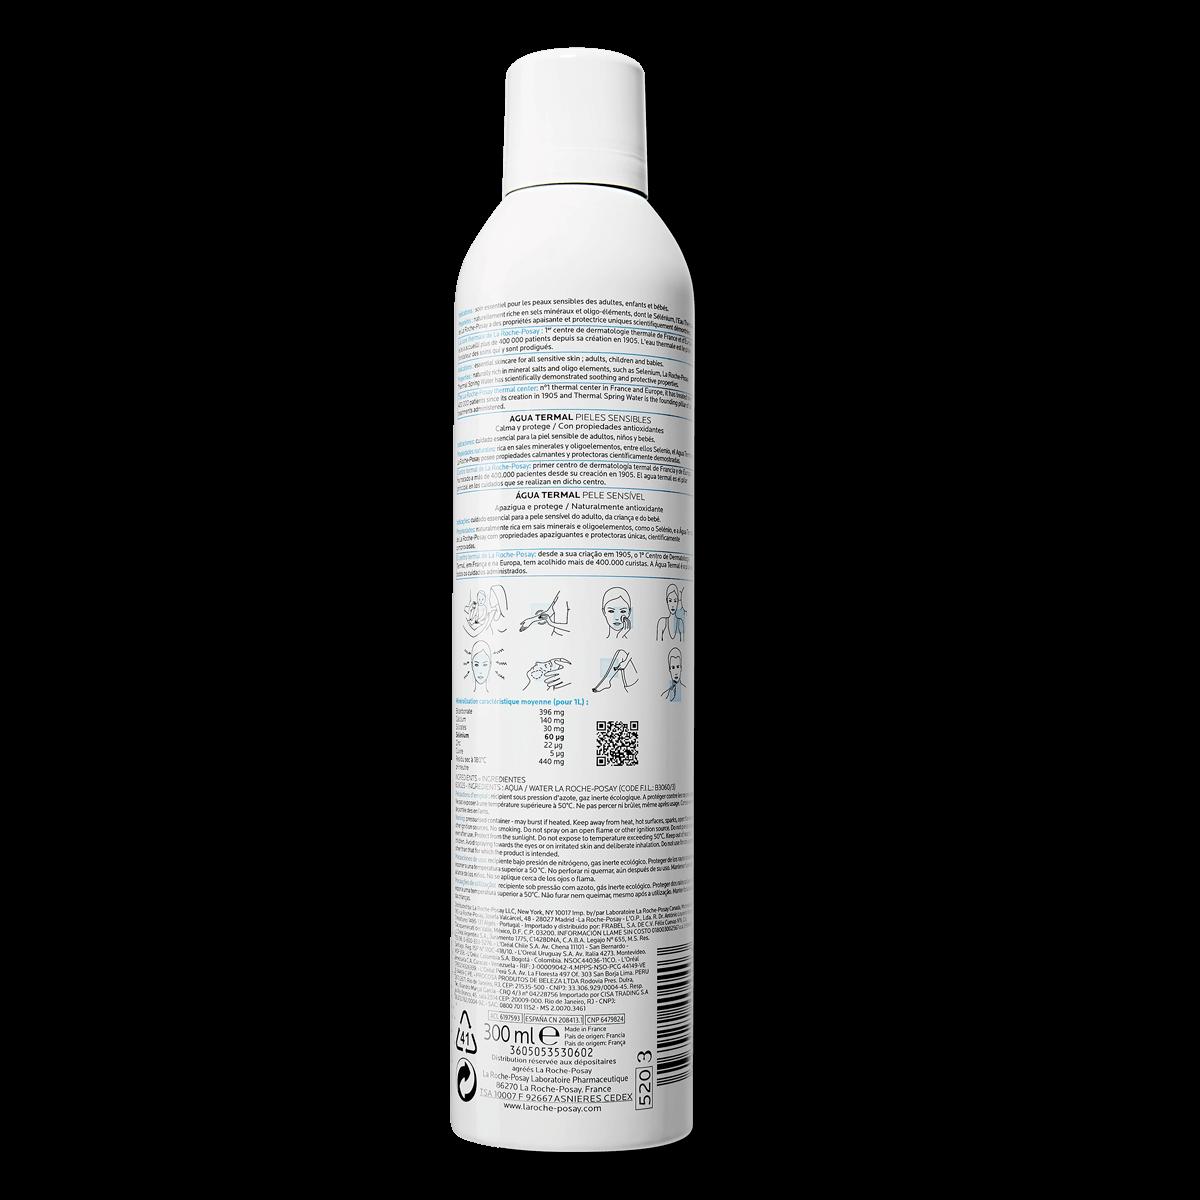 La Roche Posay ProduktSide Termalsk kildevand 300ml 3433422404403 Ba